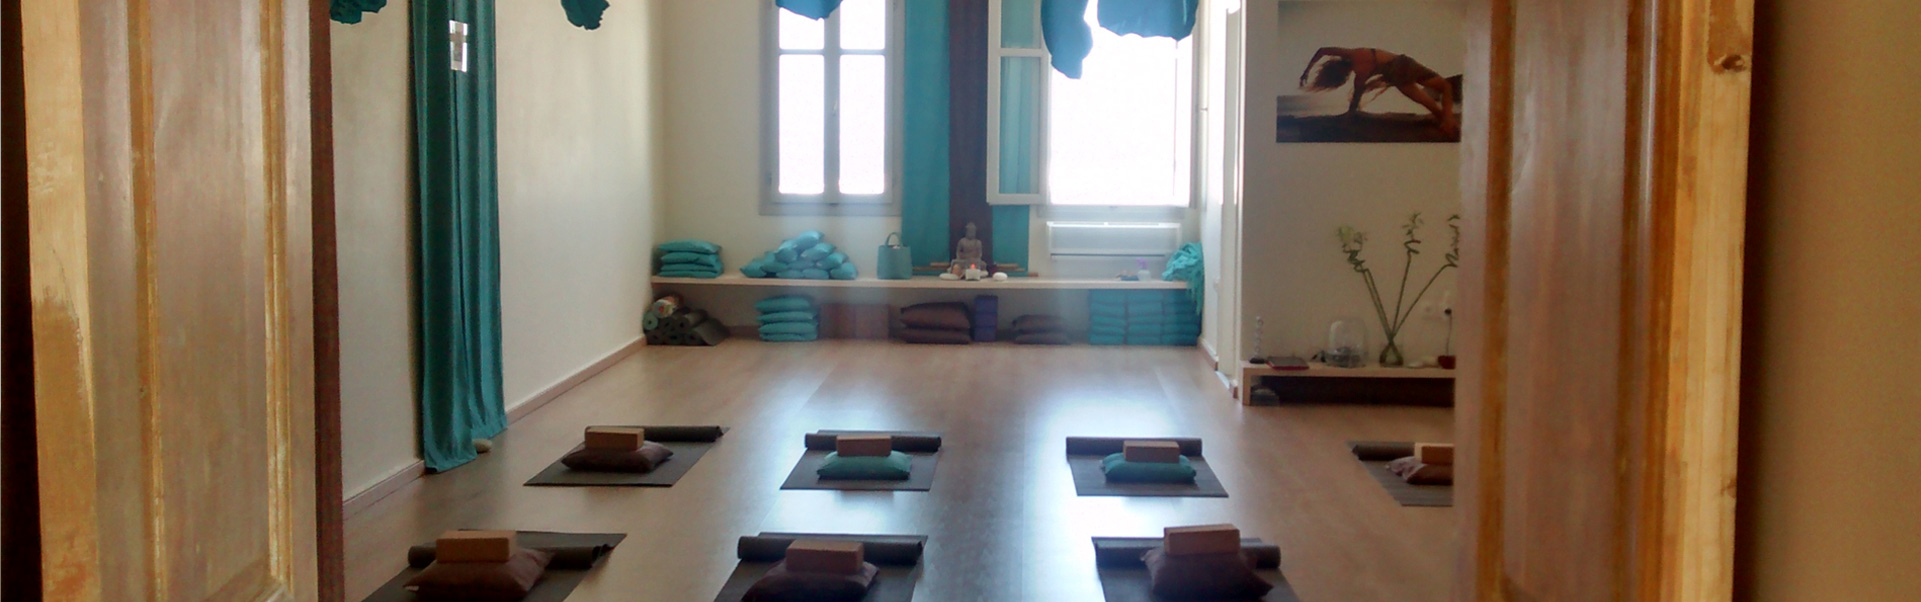 www.anpnoeyoga.com-teacher training hatha vinyasa-Irana JiAn Fouroulis Paros-Greece-